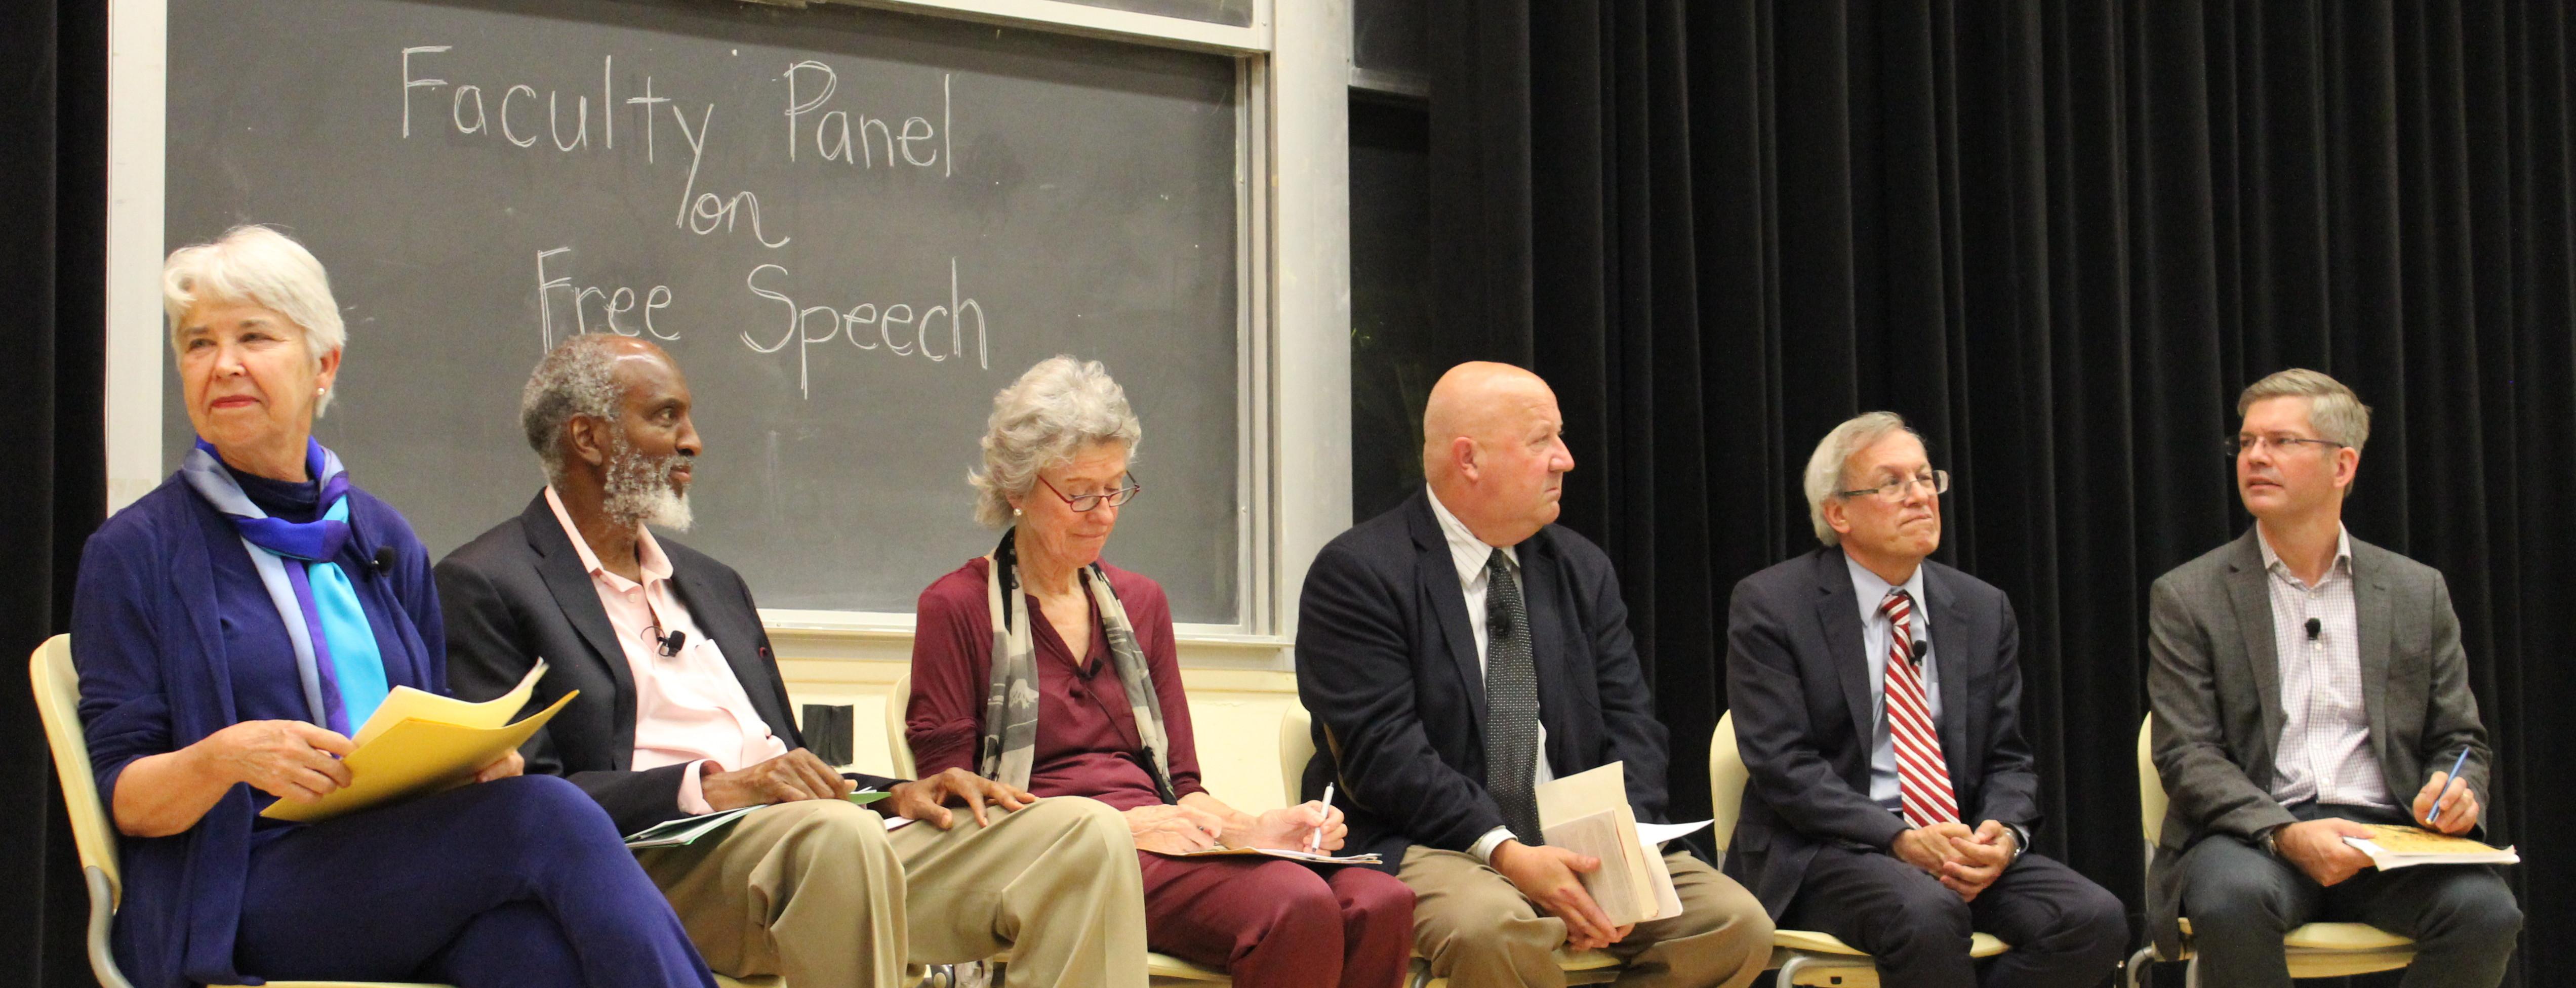 Faculty panel on free speech